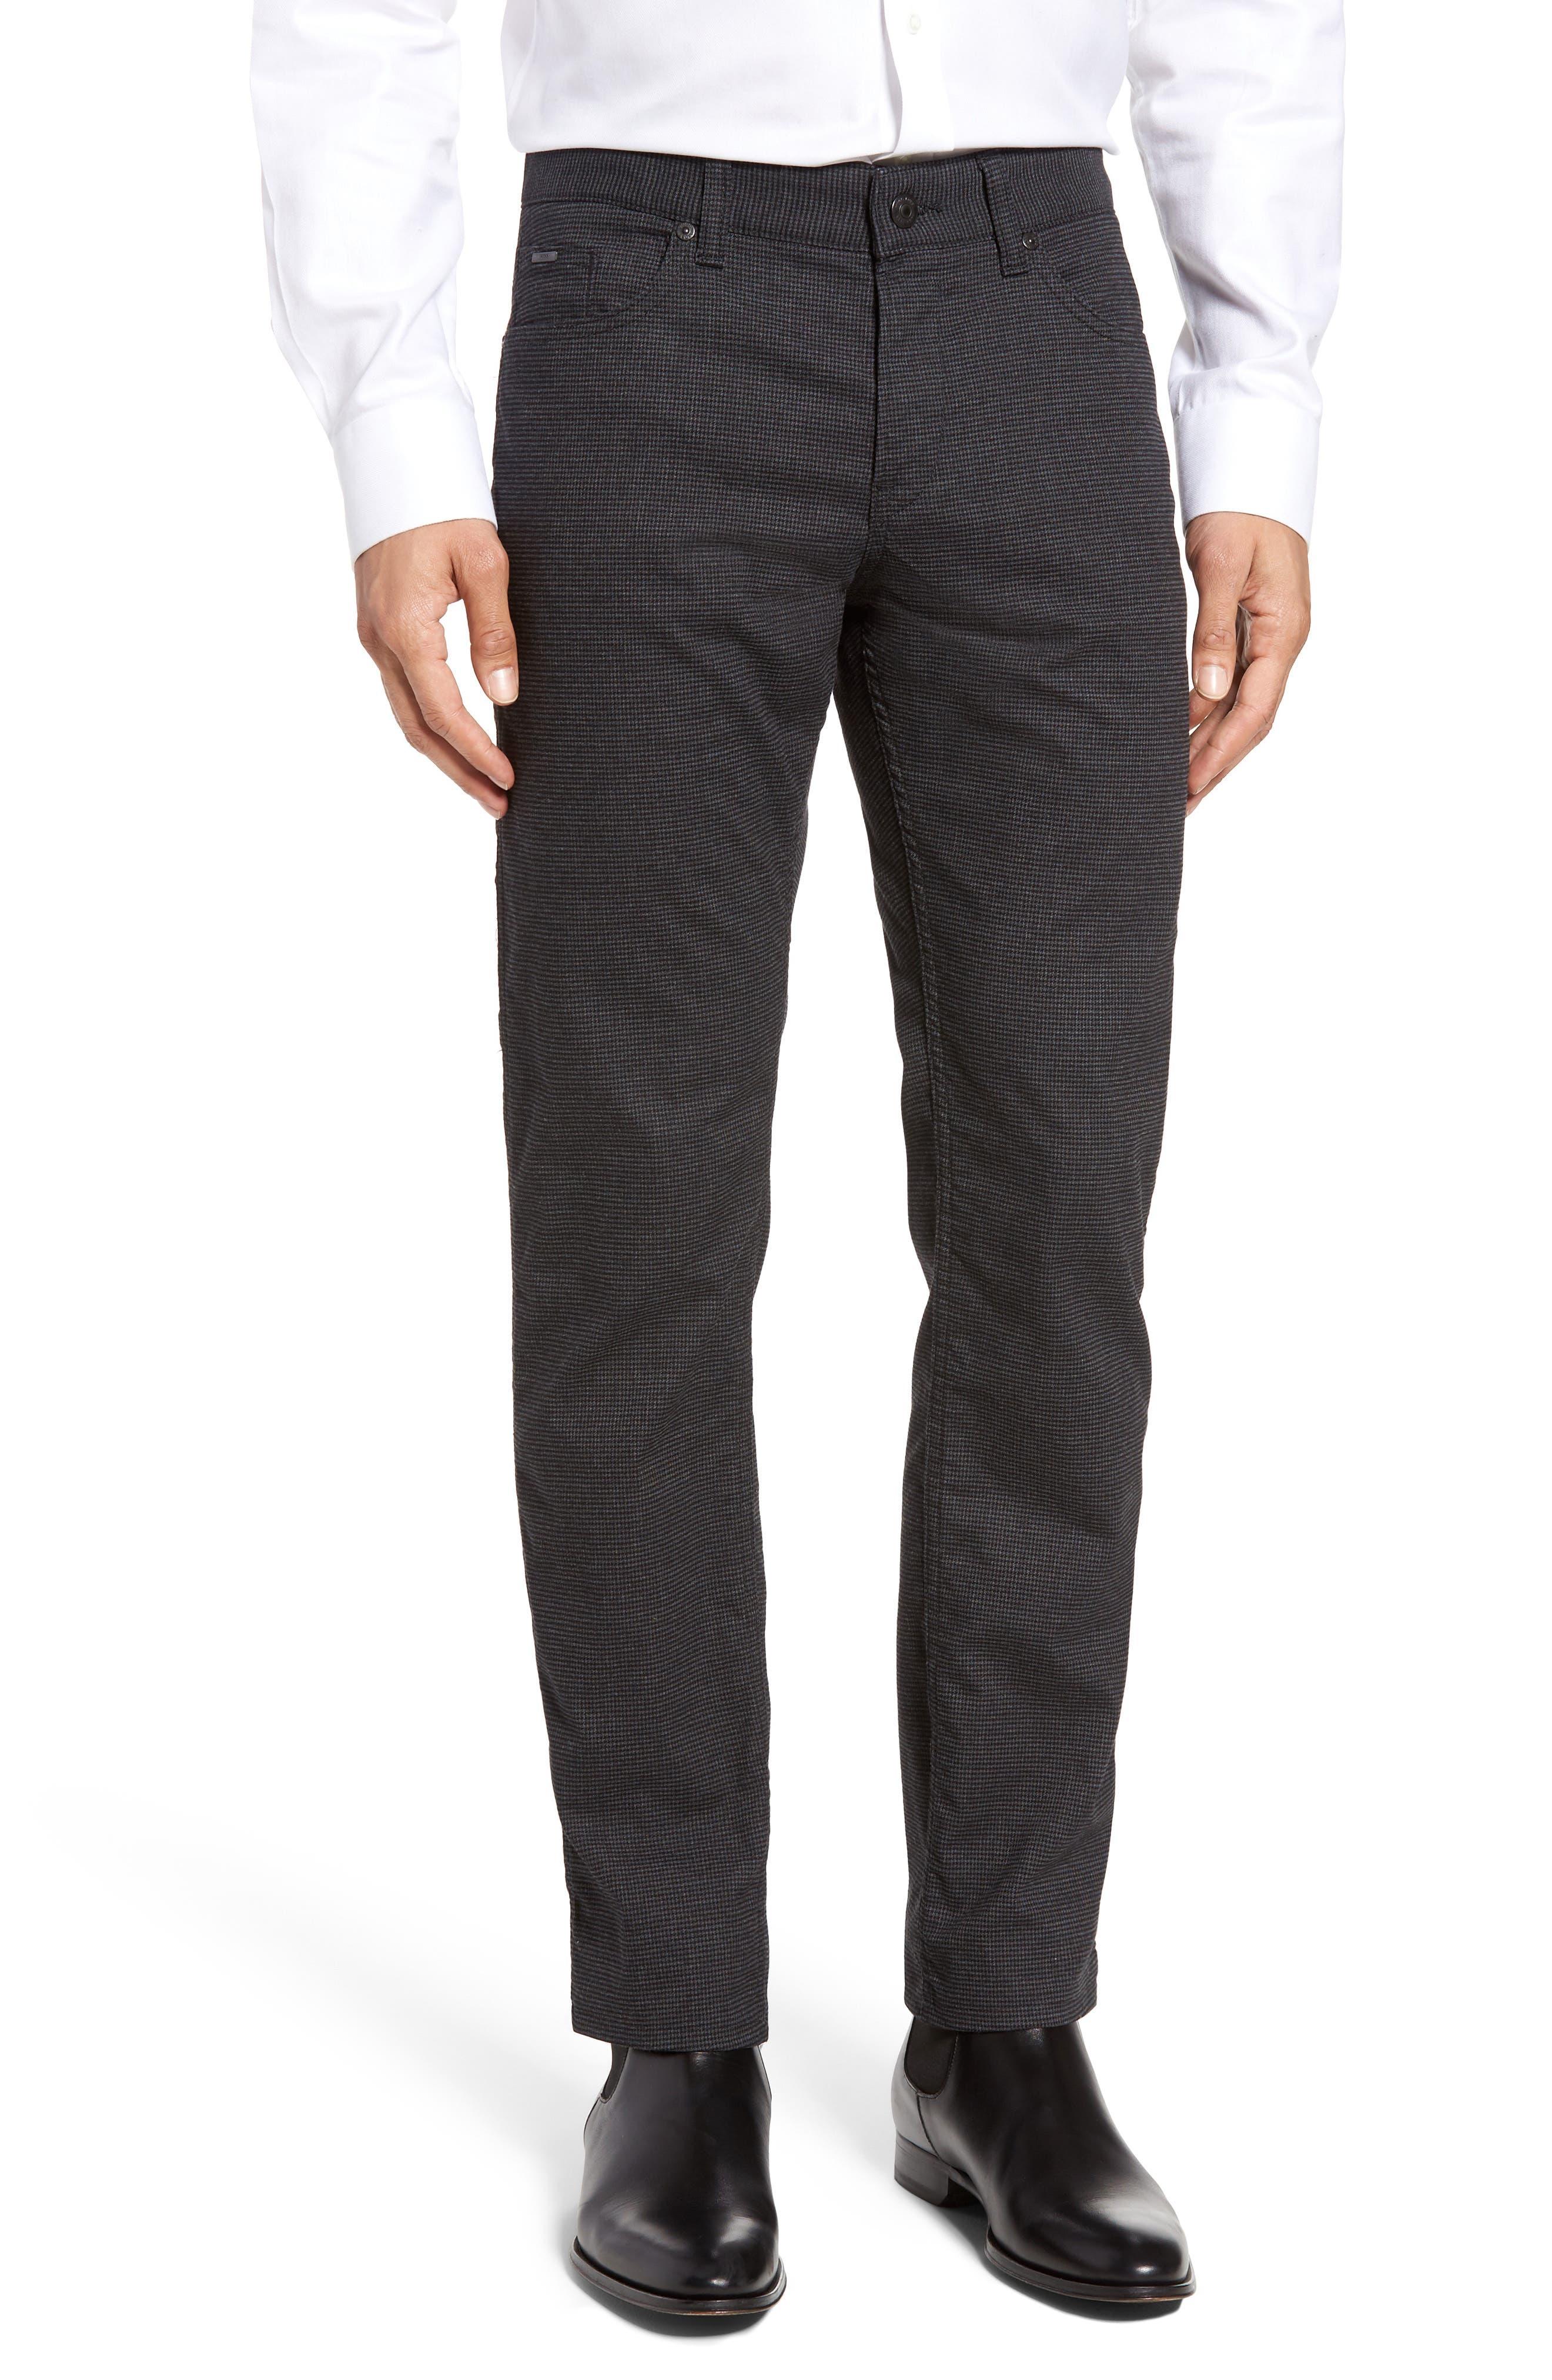 BOSS Delaware Houndstooth Slim 5-Pocket Pants